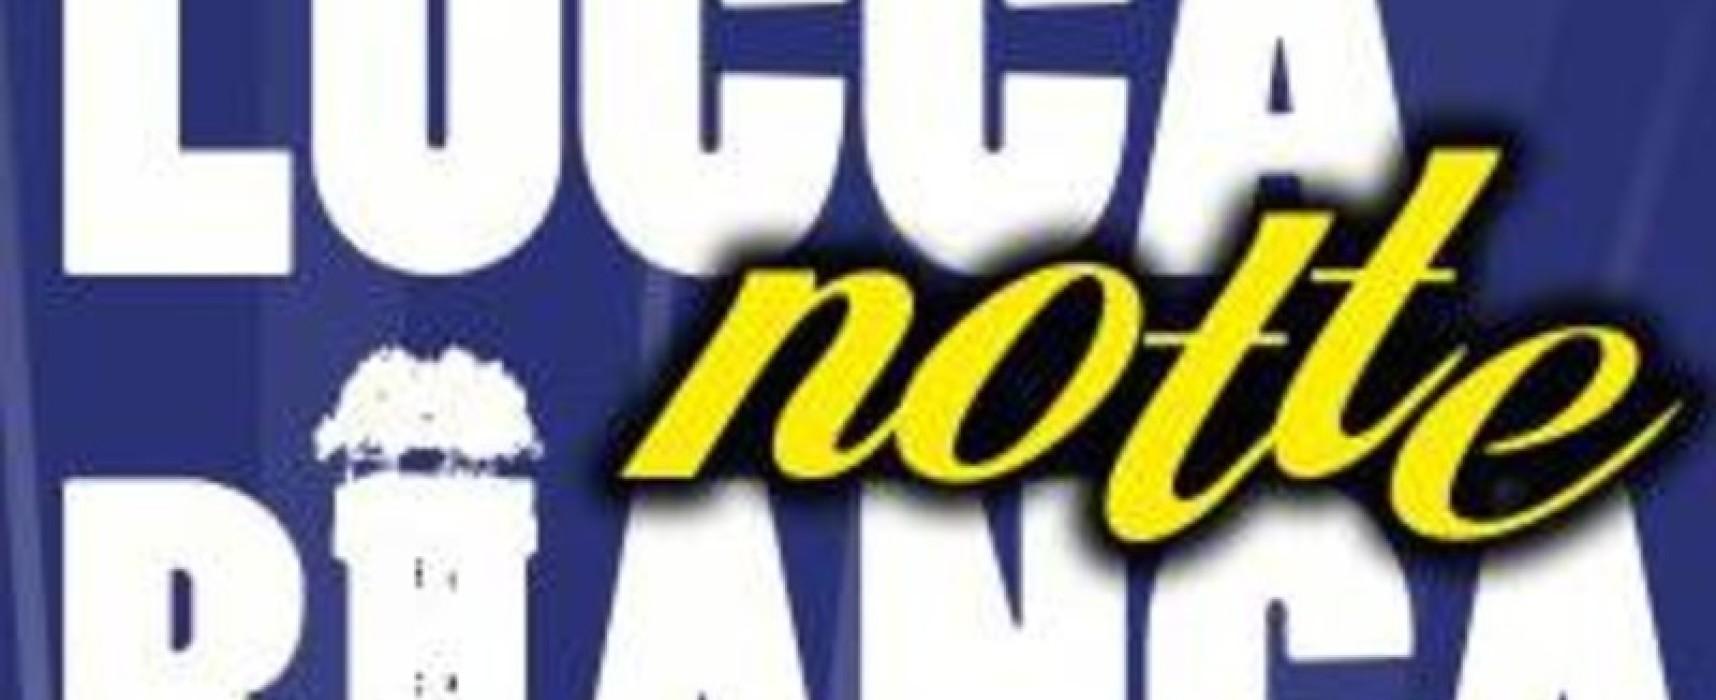 NOTTE BIANCA, FUMATA BIANCA: L'EVENTO SI FA